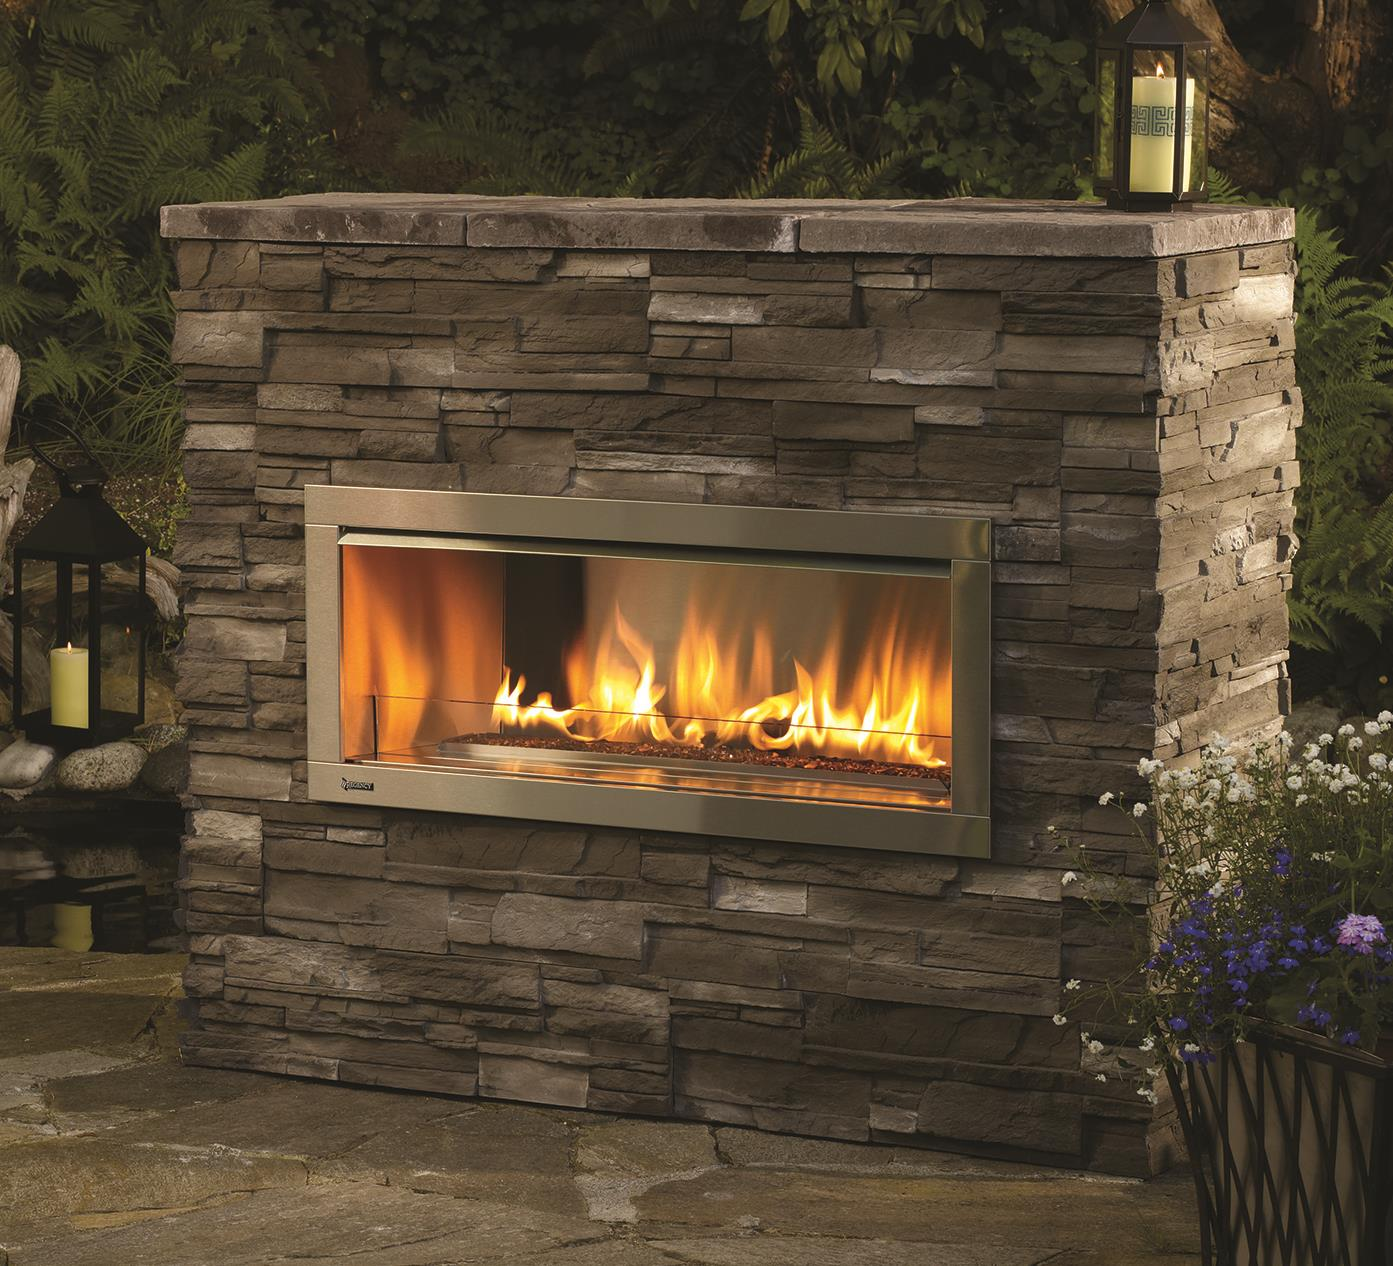 Outdoor Gas Fireplaces - Horizon HZO42 - Kastle Fireplace on Outdoor Gas Fireplace For Deck id=60230